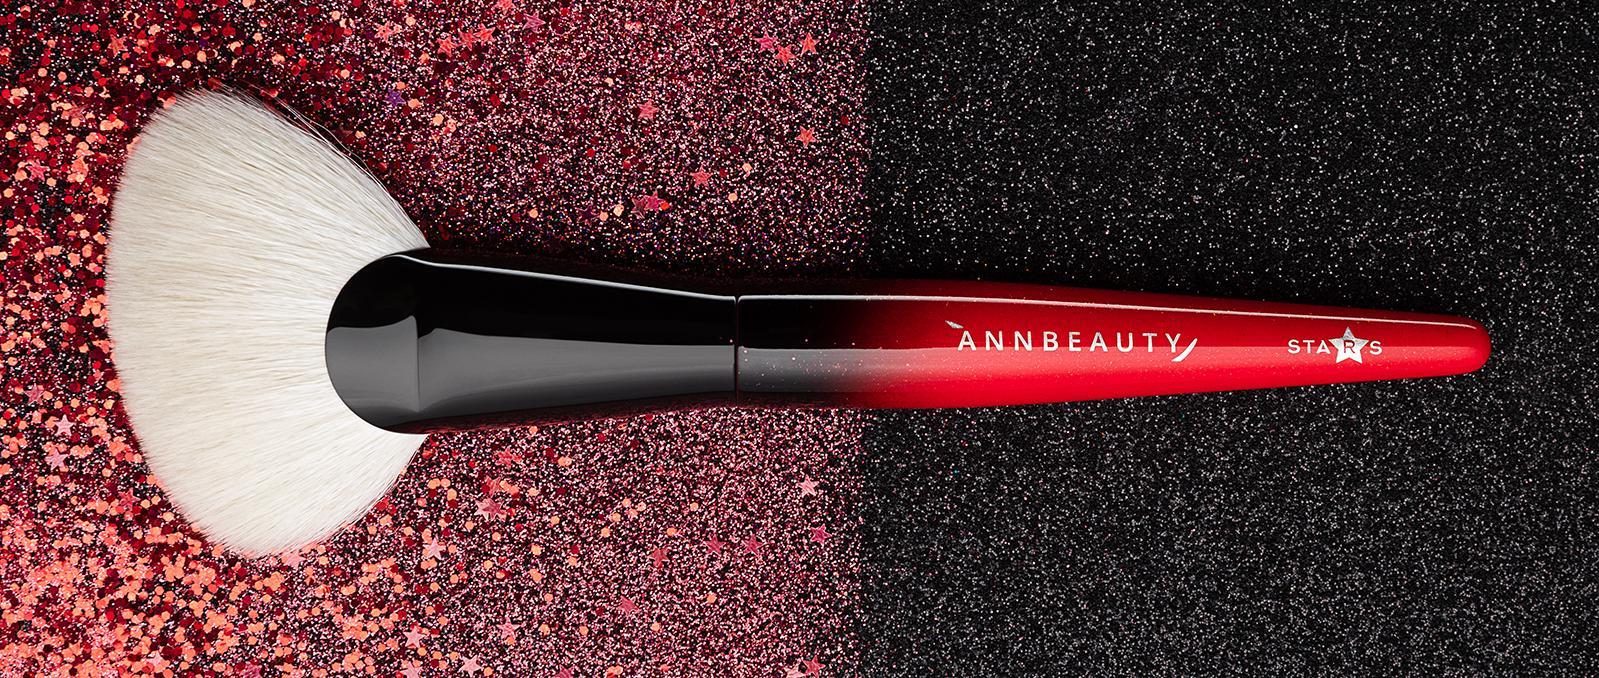 Annbeauty STARS3 кисть